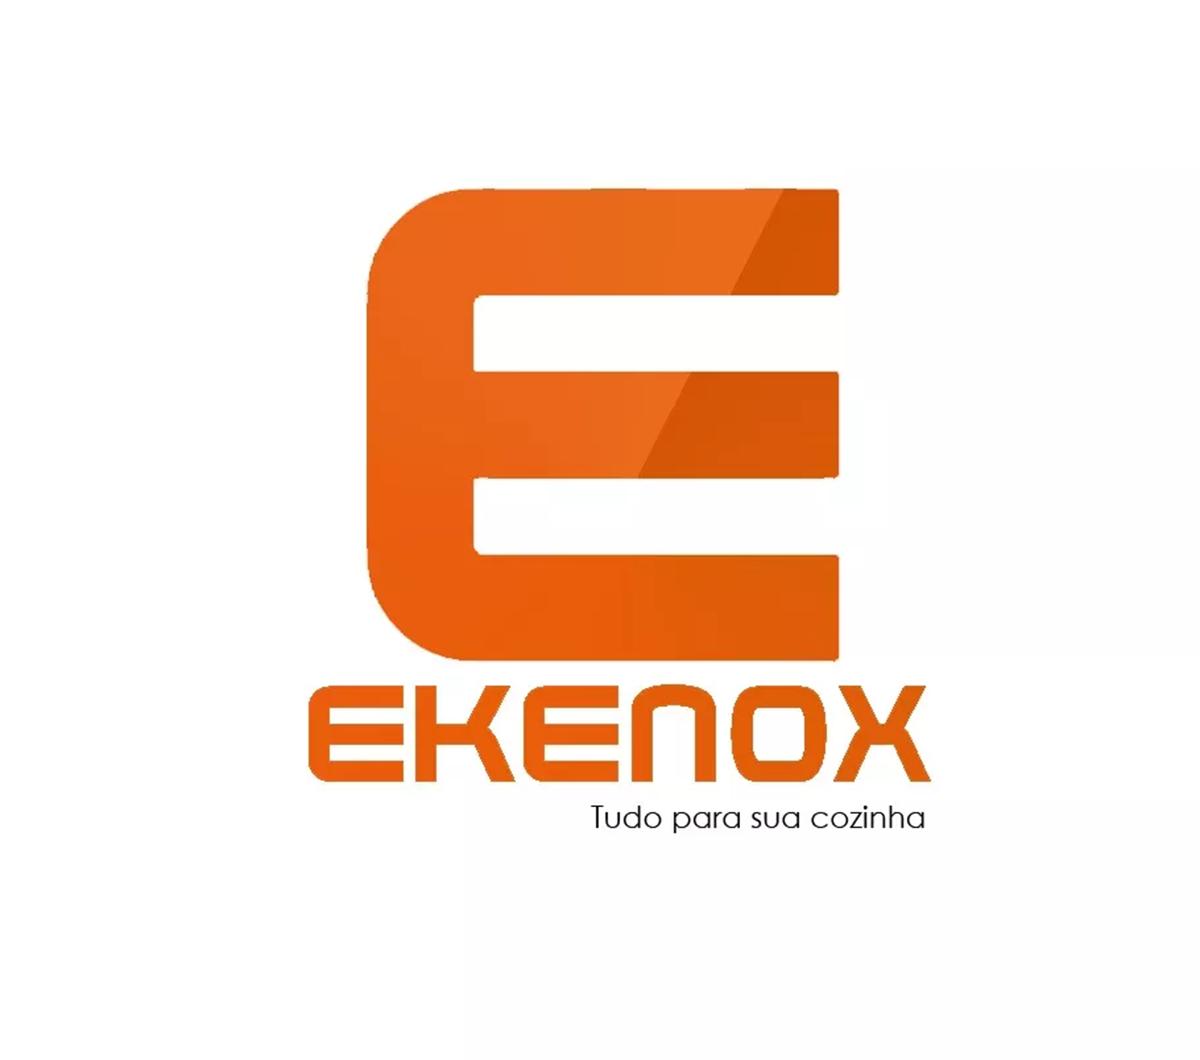 Kit 4 Porta Moedas Perueiro  - EKENOX- Equipamentos Industriais